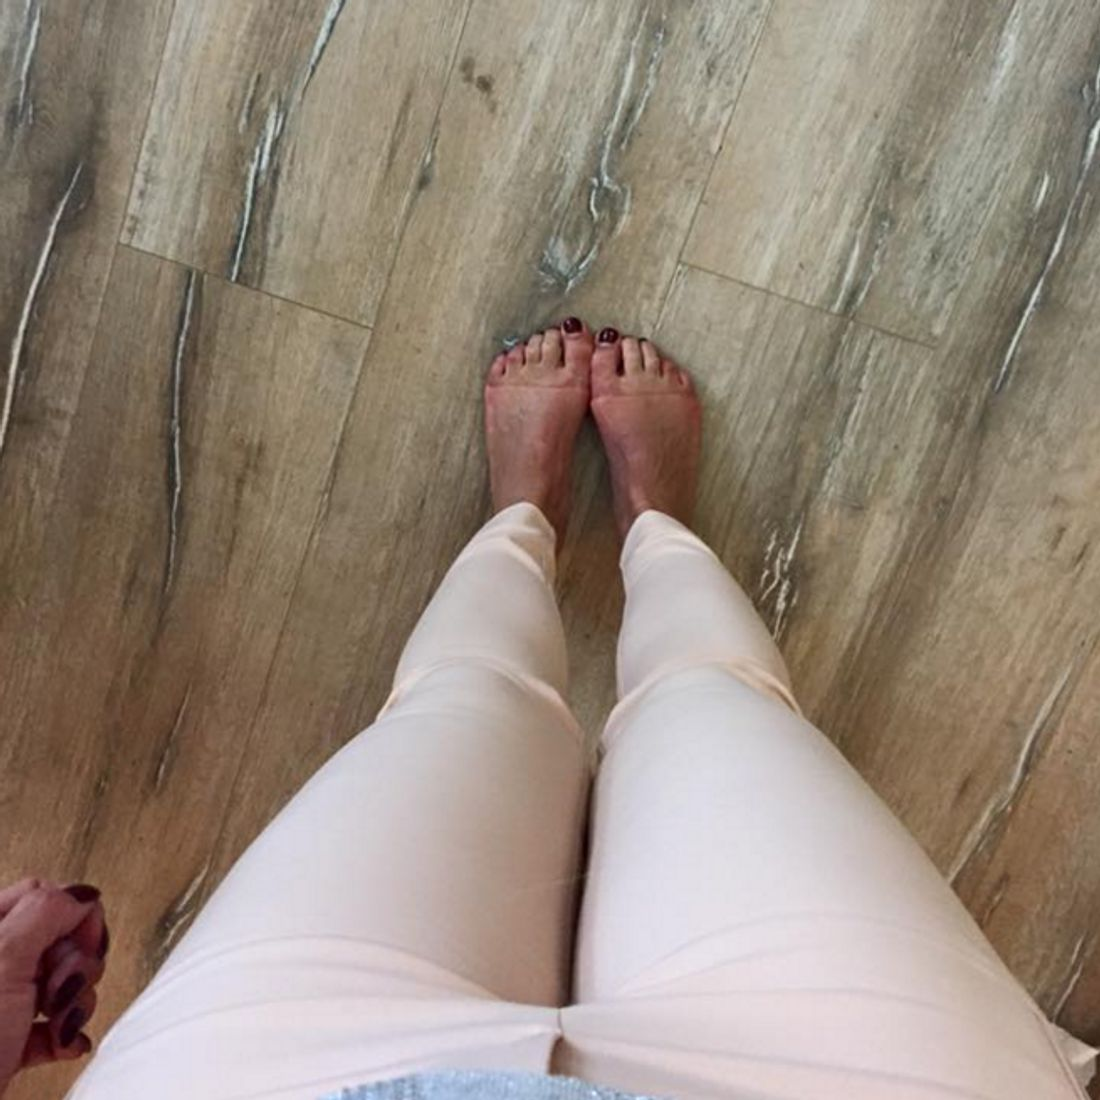 Daniela Katzenberger tun die Füße weh